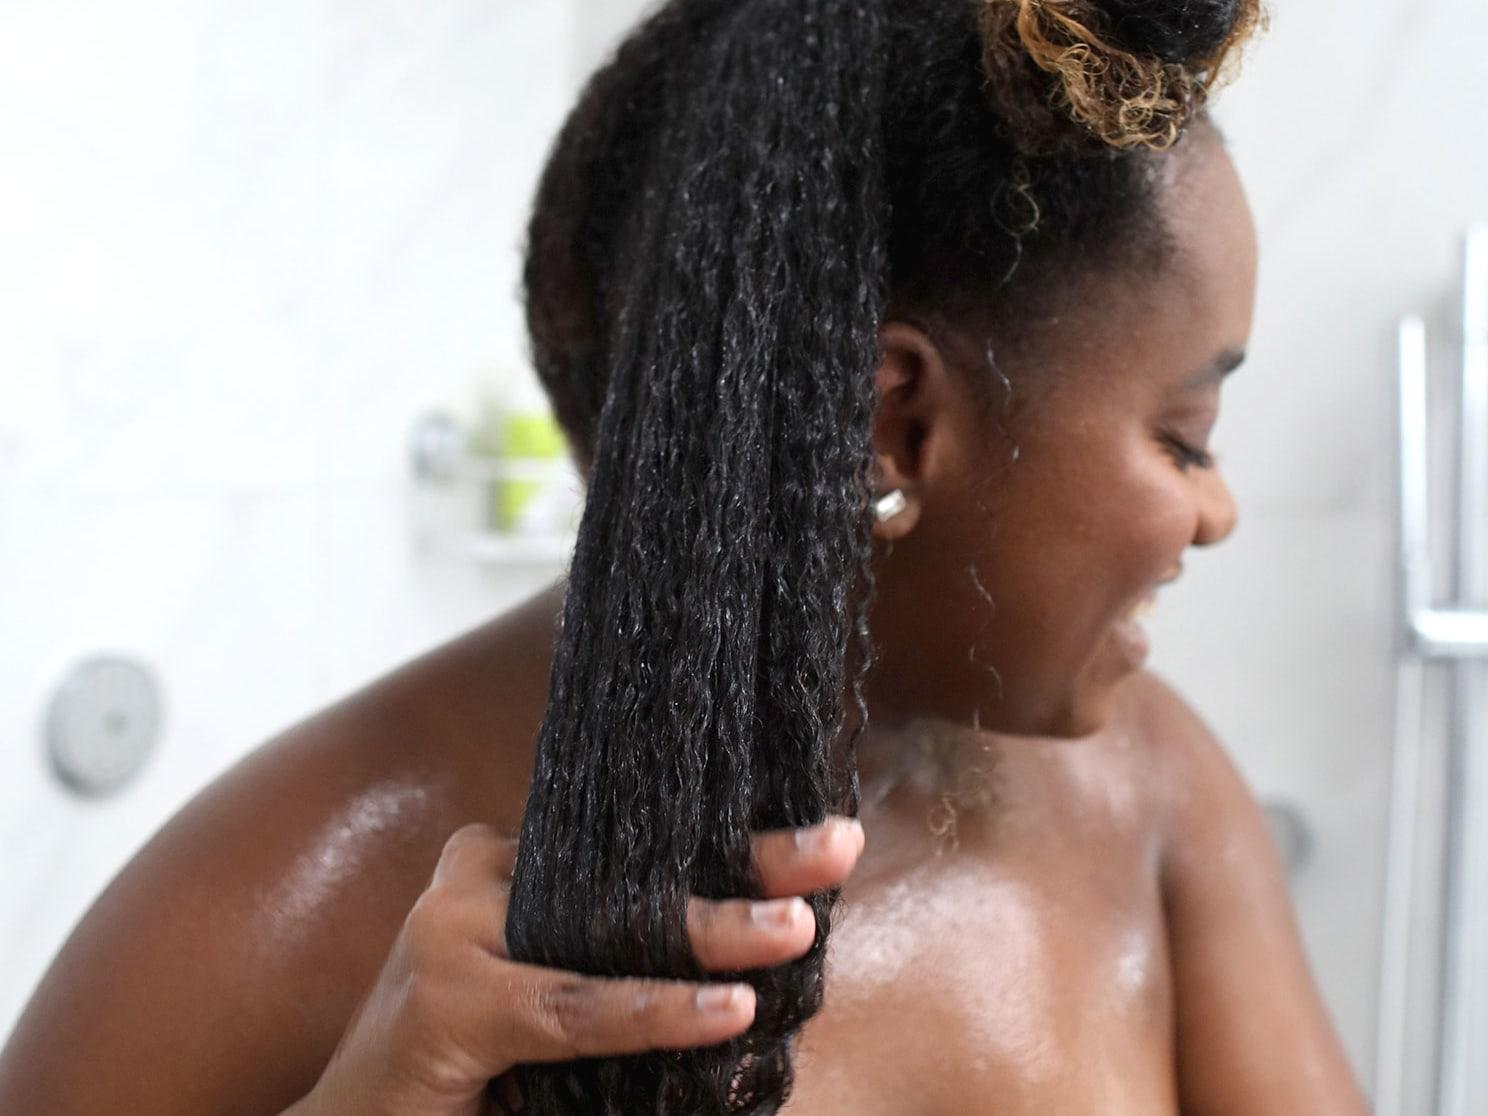 woman in the shower scrubbing wet dark curly hair